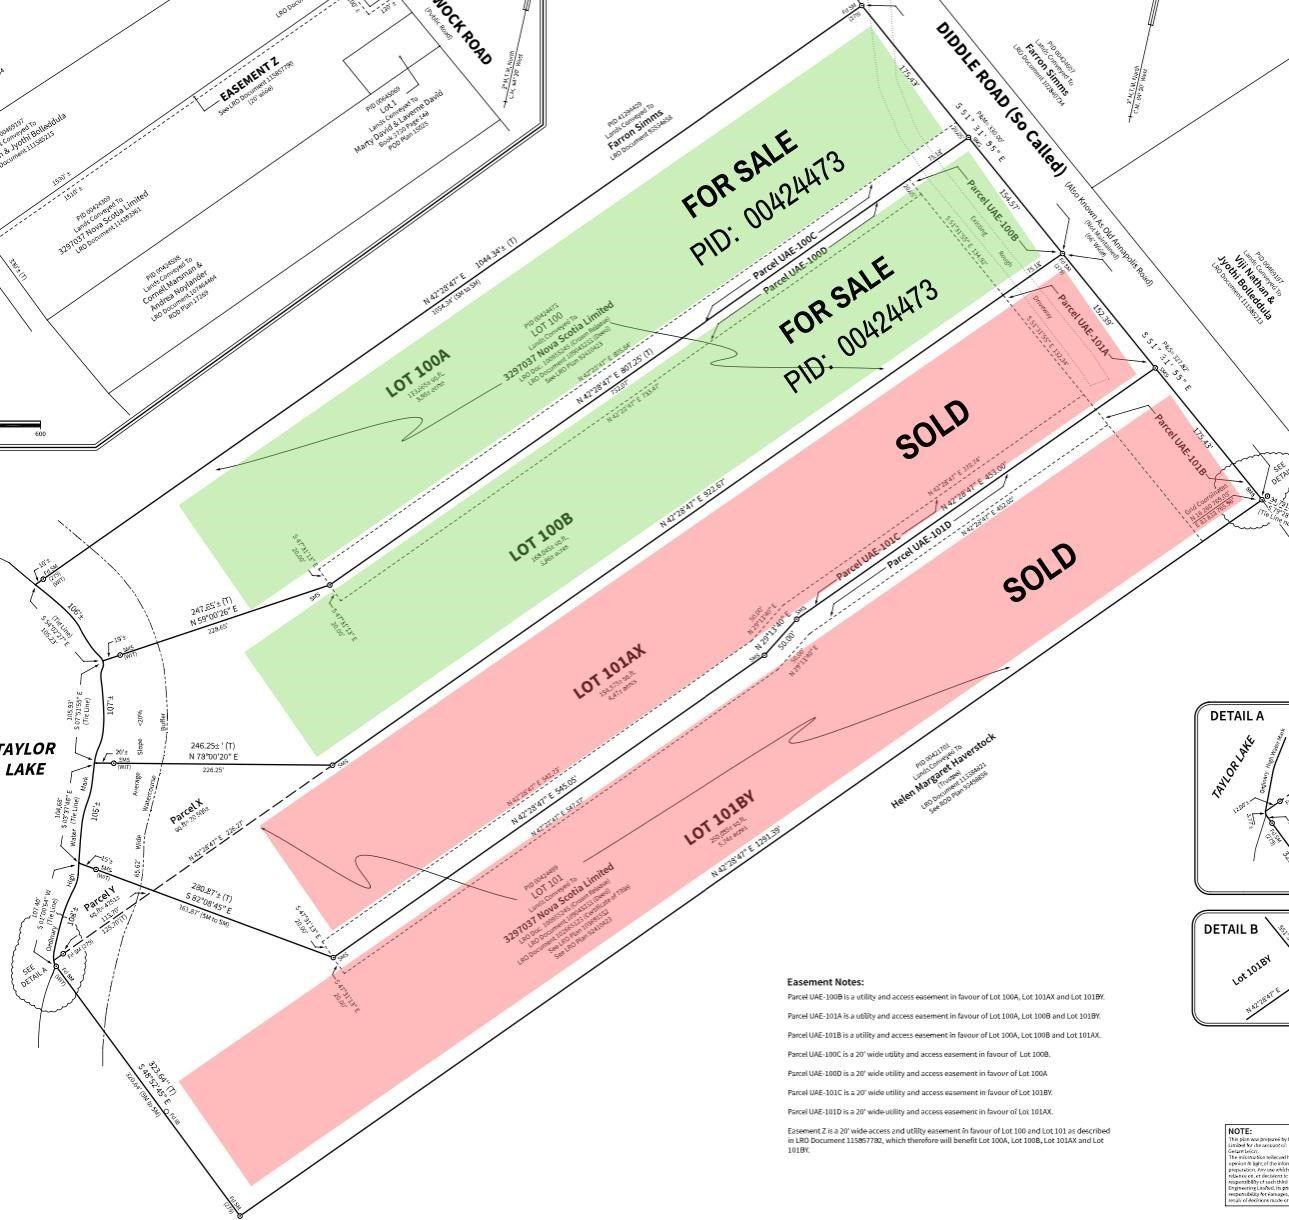 Main Photo: 100B Dockview Lane in Hammonds Plains: 21-Kingswood, Haliburton Hills, Hammonds Pl. Vacant Land for sale (Halifax-Dartmouth)  : MLS®# 202023537